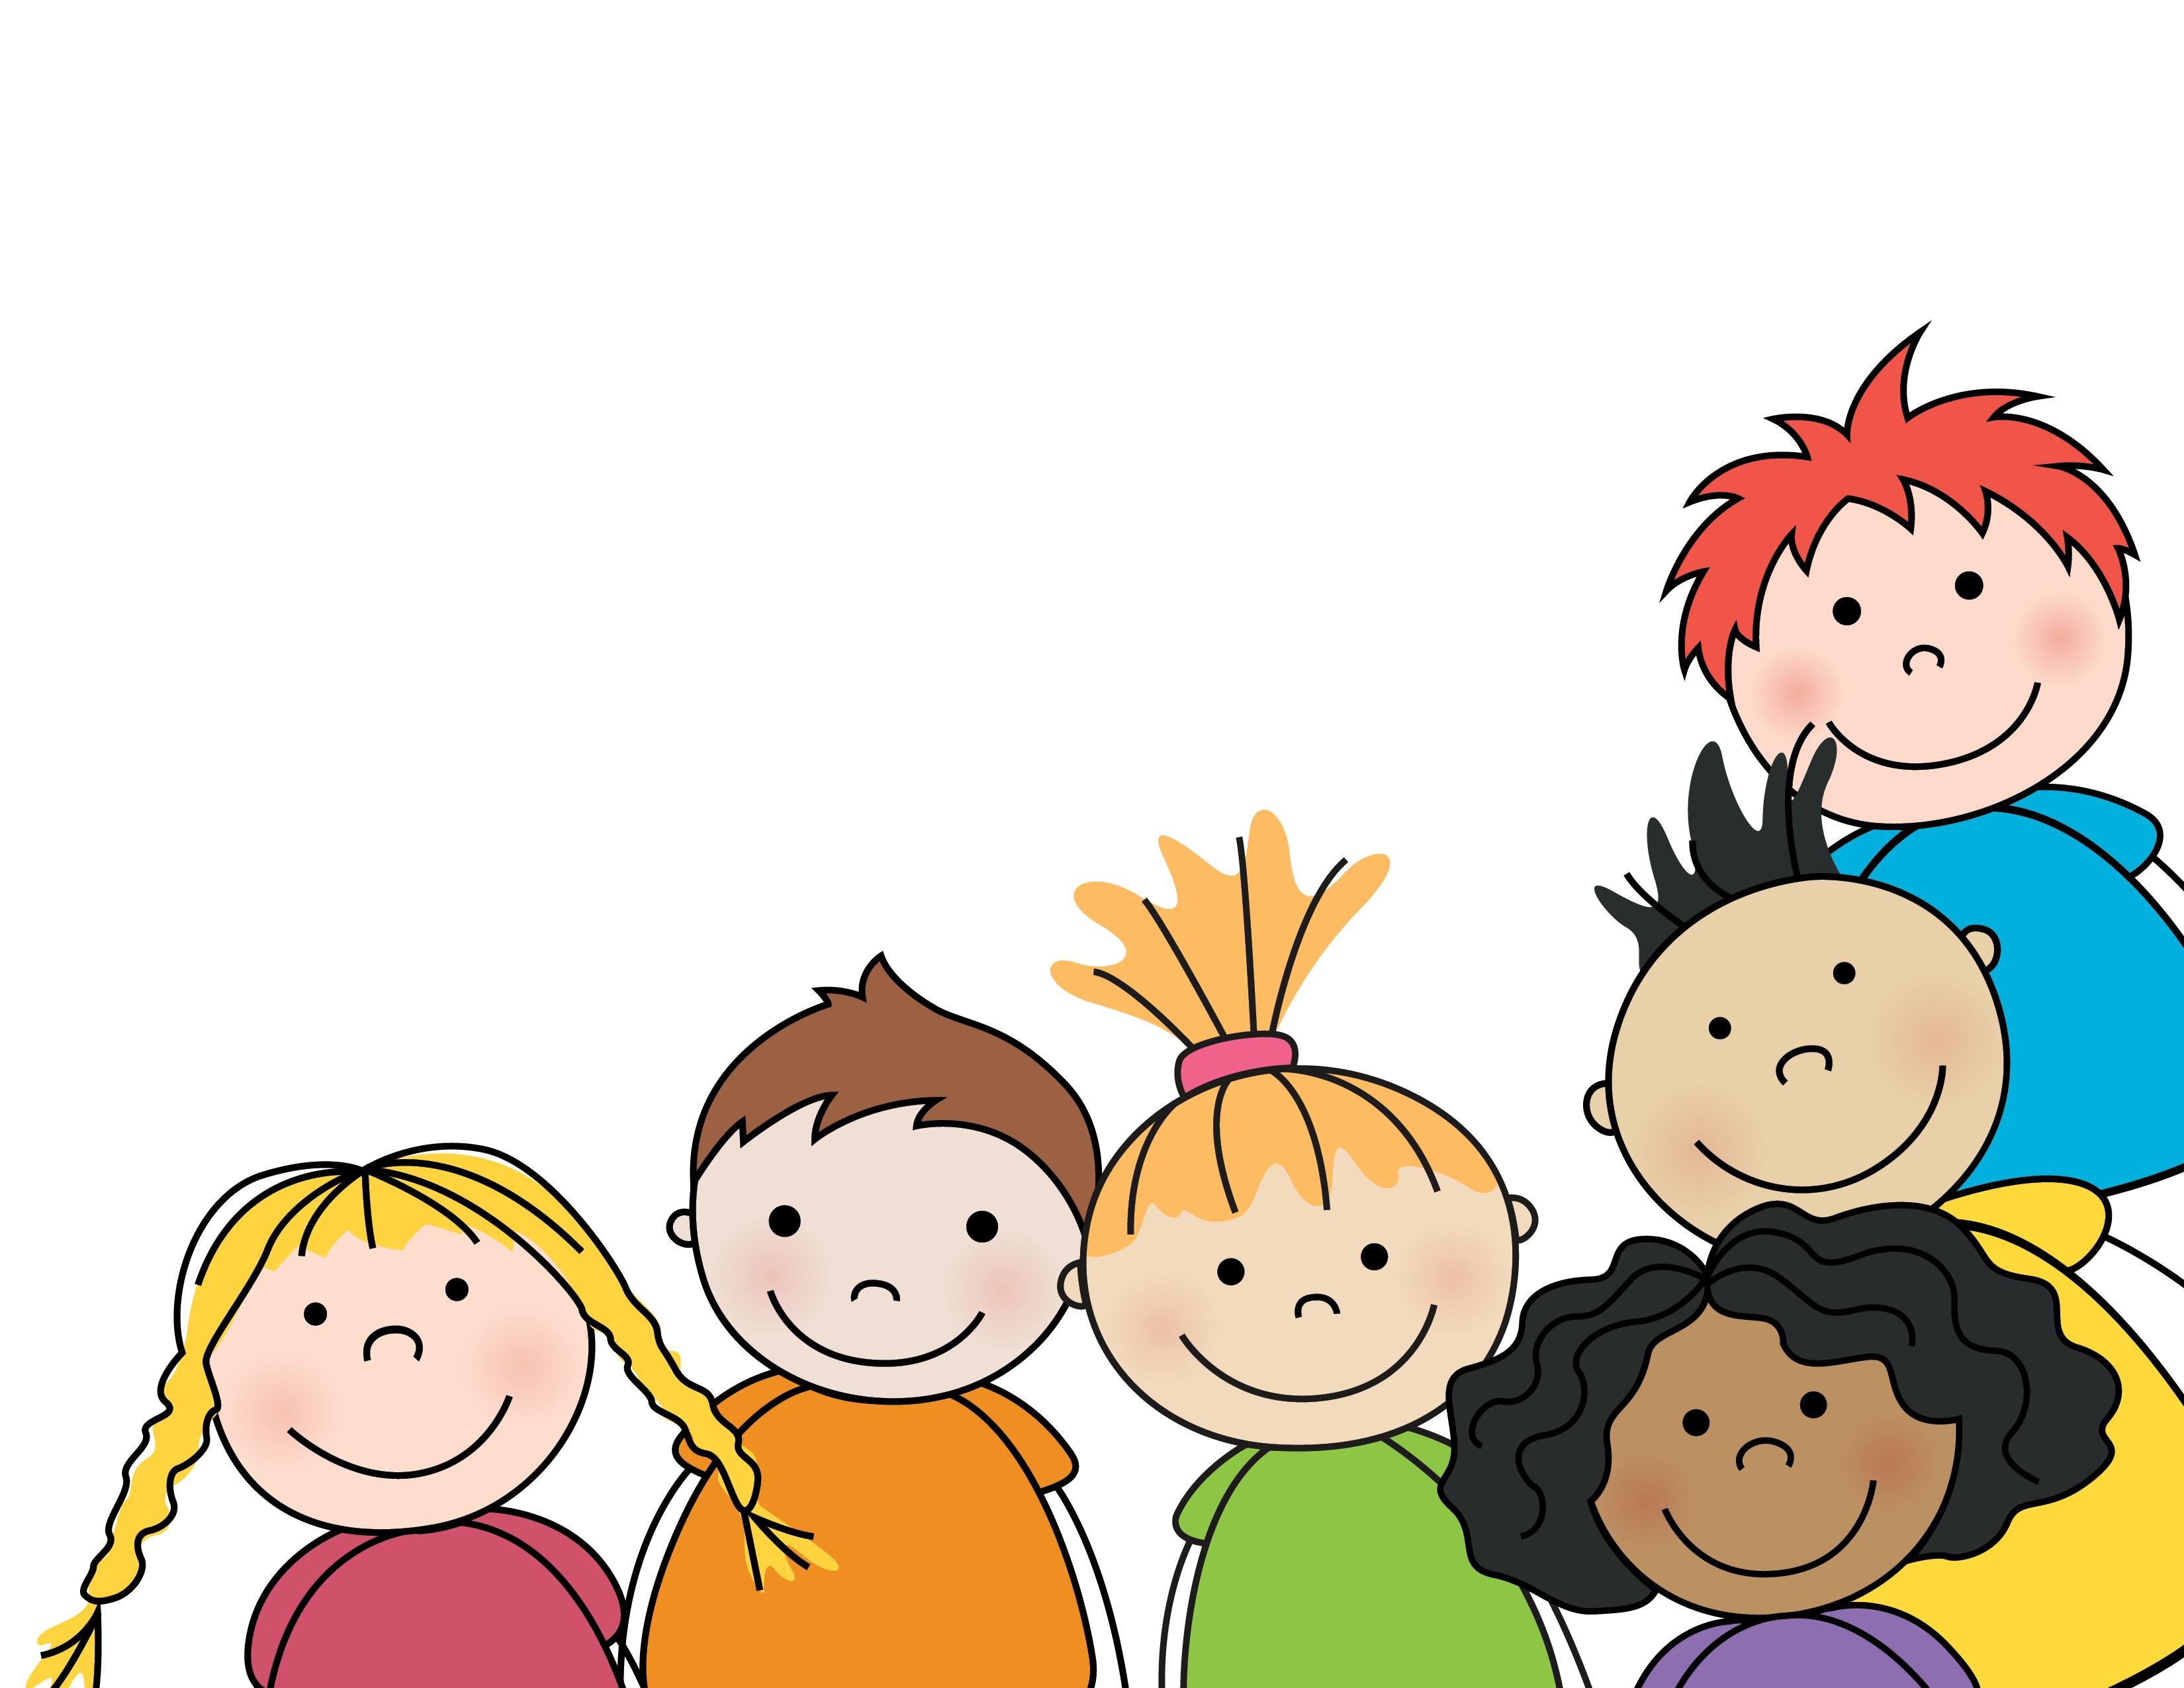 svg free library Graduation program free images. Kindergarten clipart.